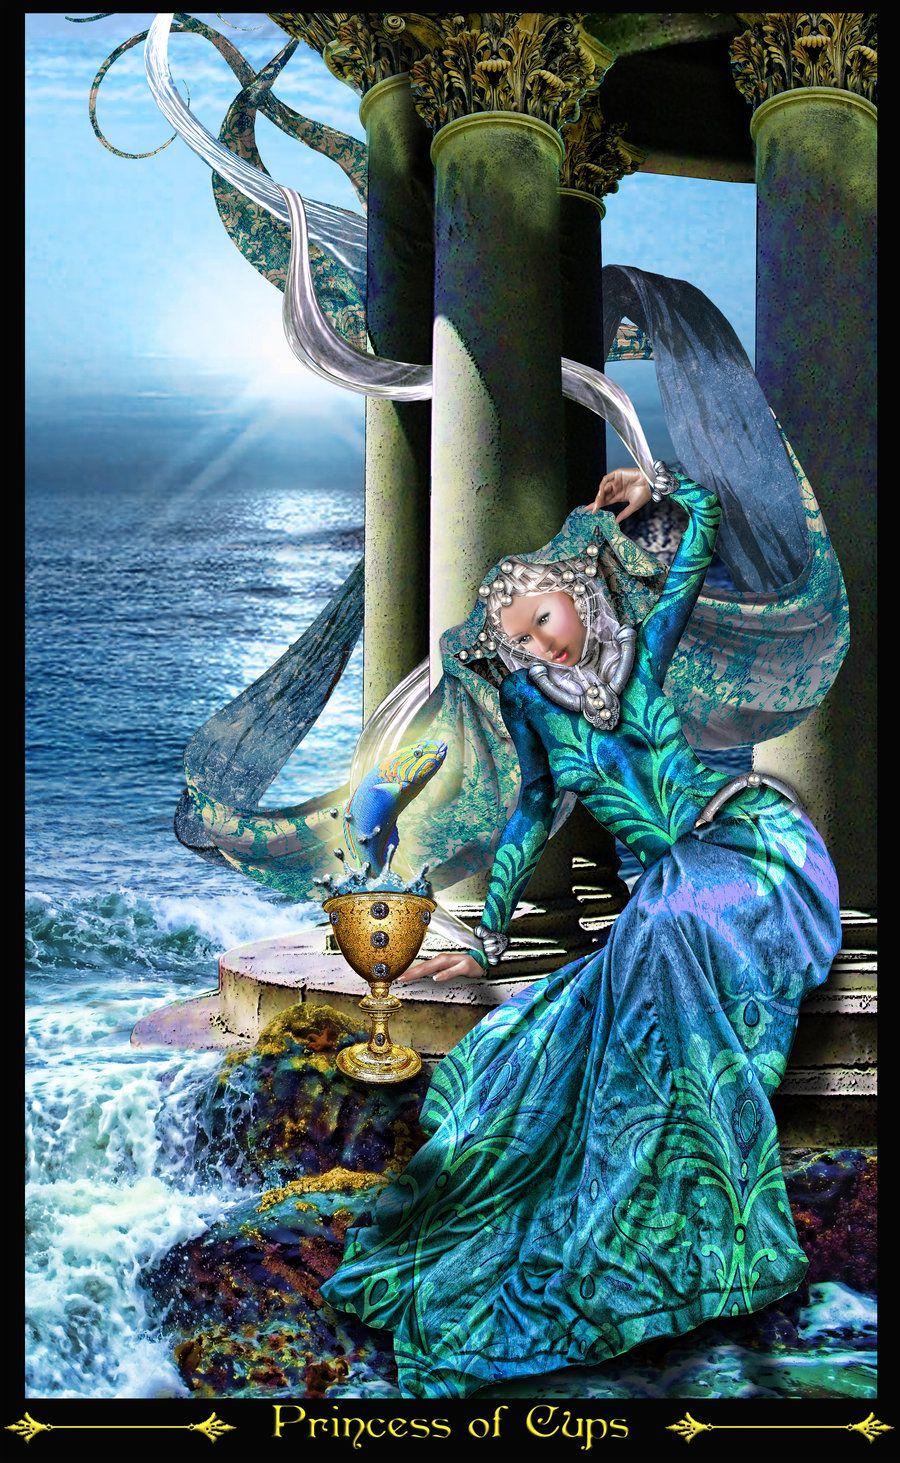 Resultado de imagem para queen of cups tarot